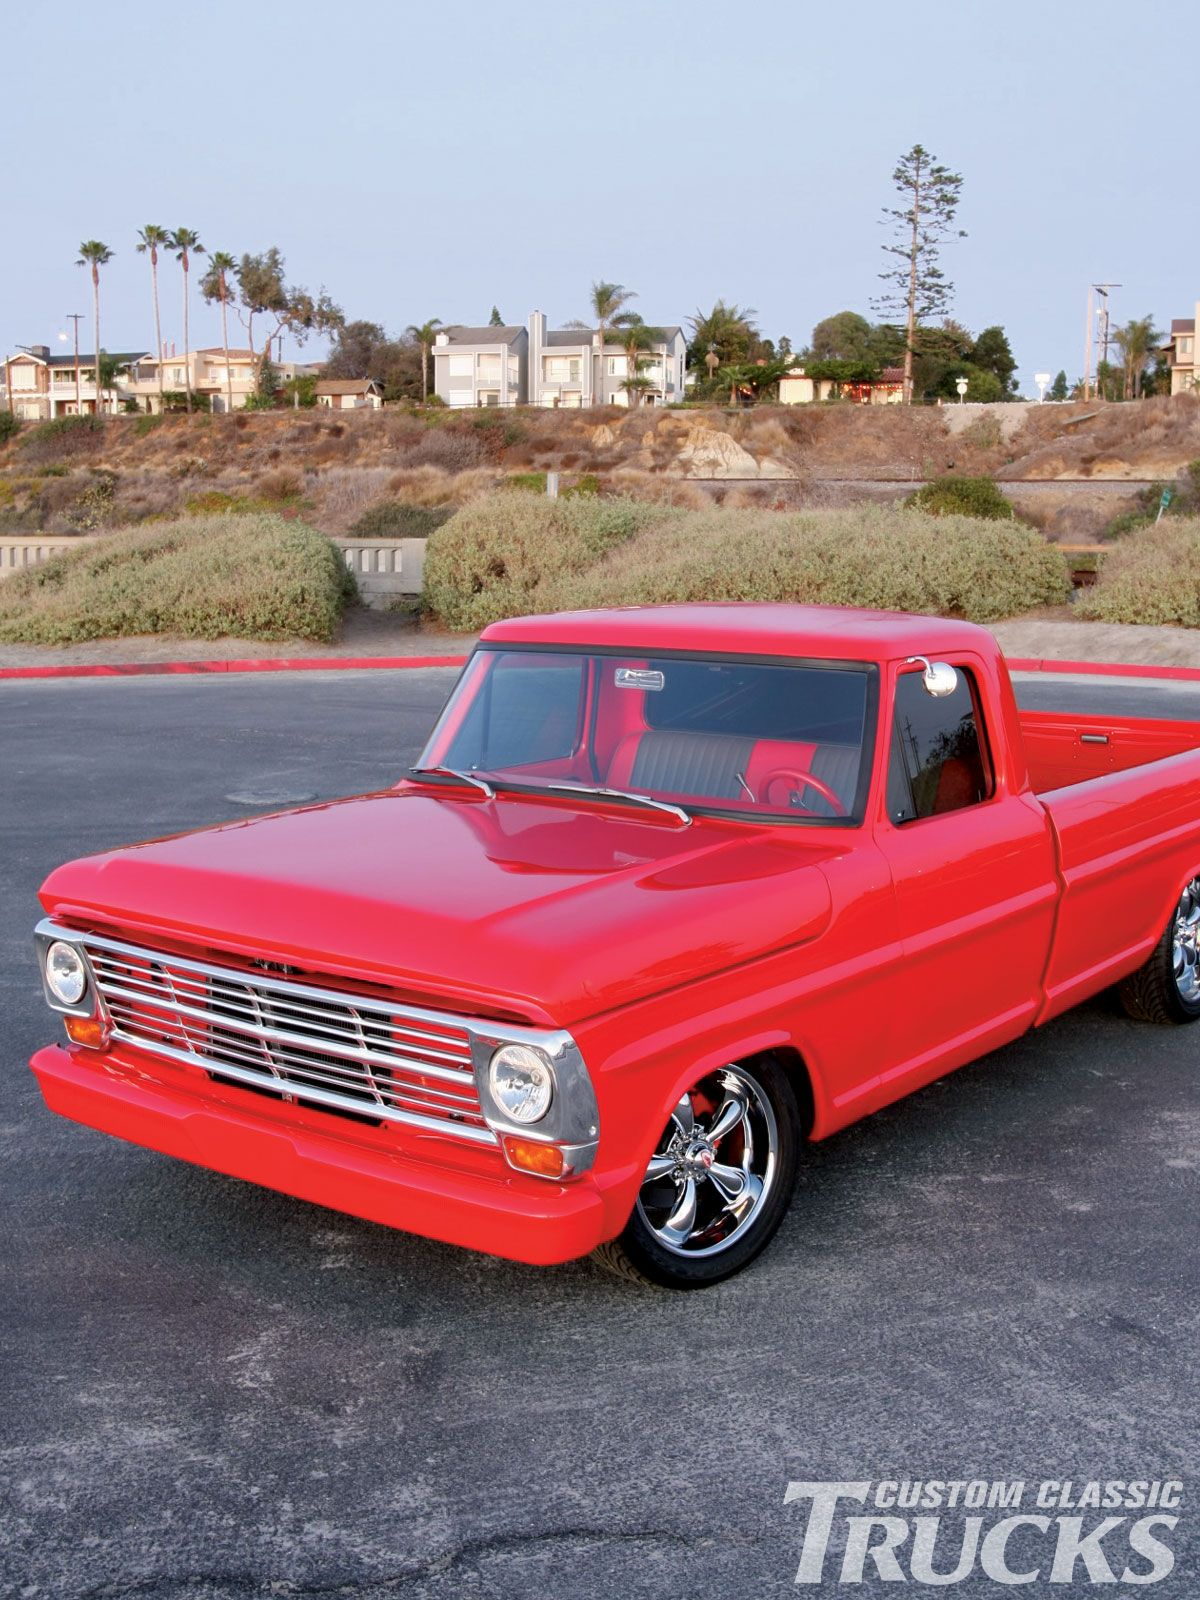 vintage Ford truck | Trucks n such | Pinterest | Ford trucks, Ford ...